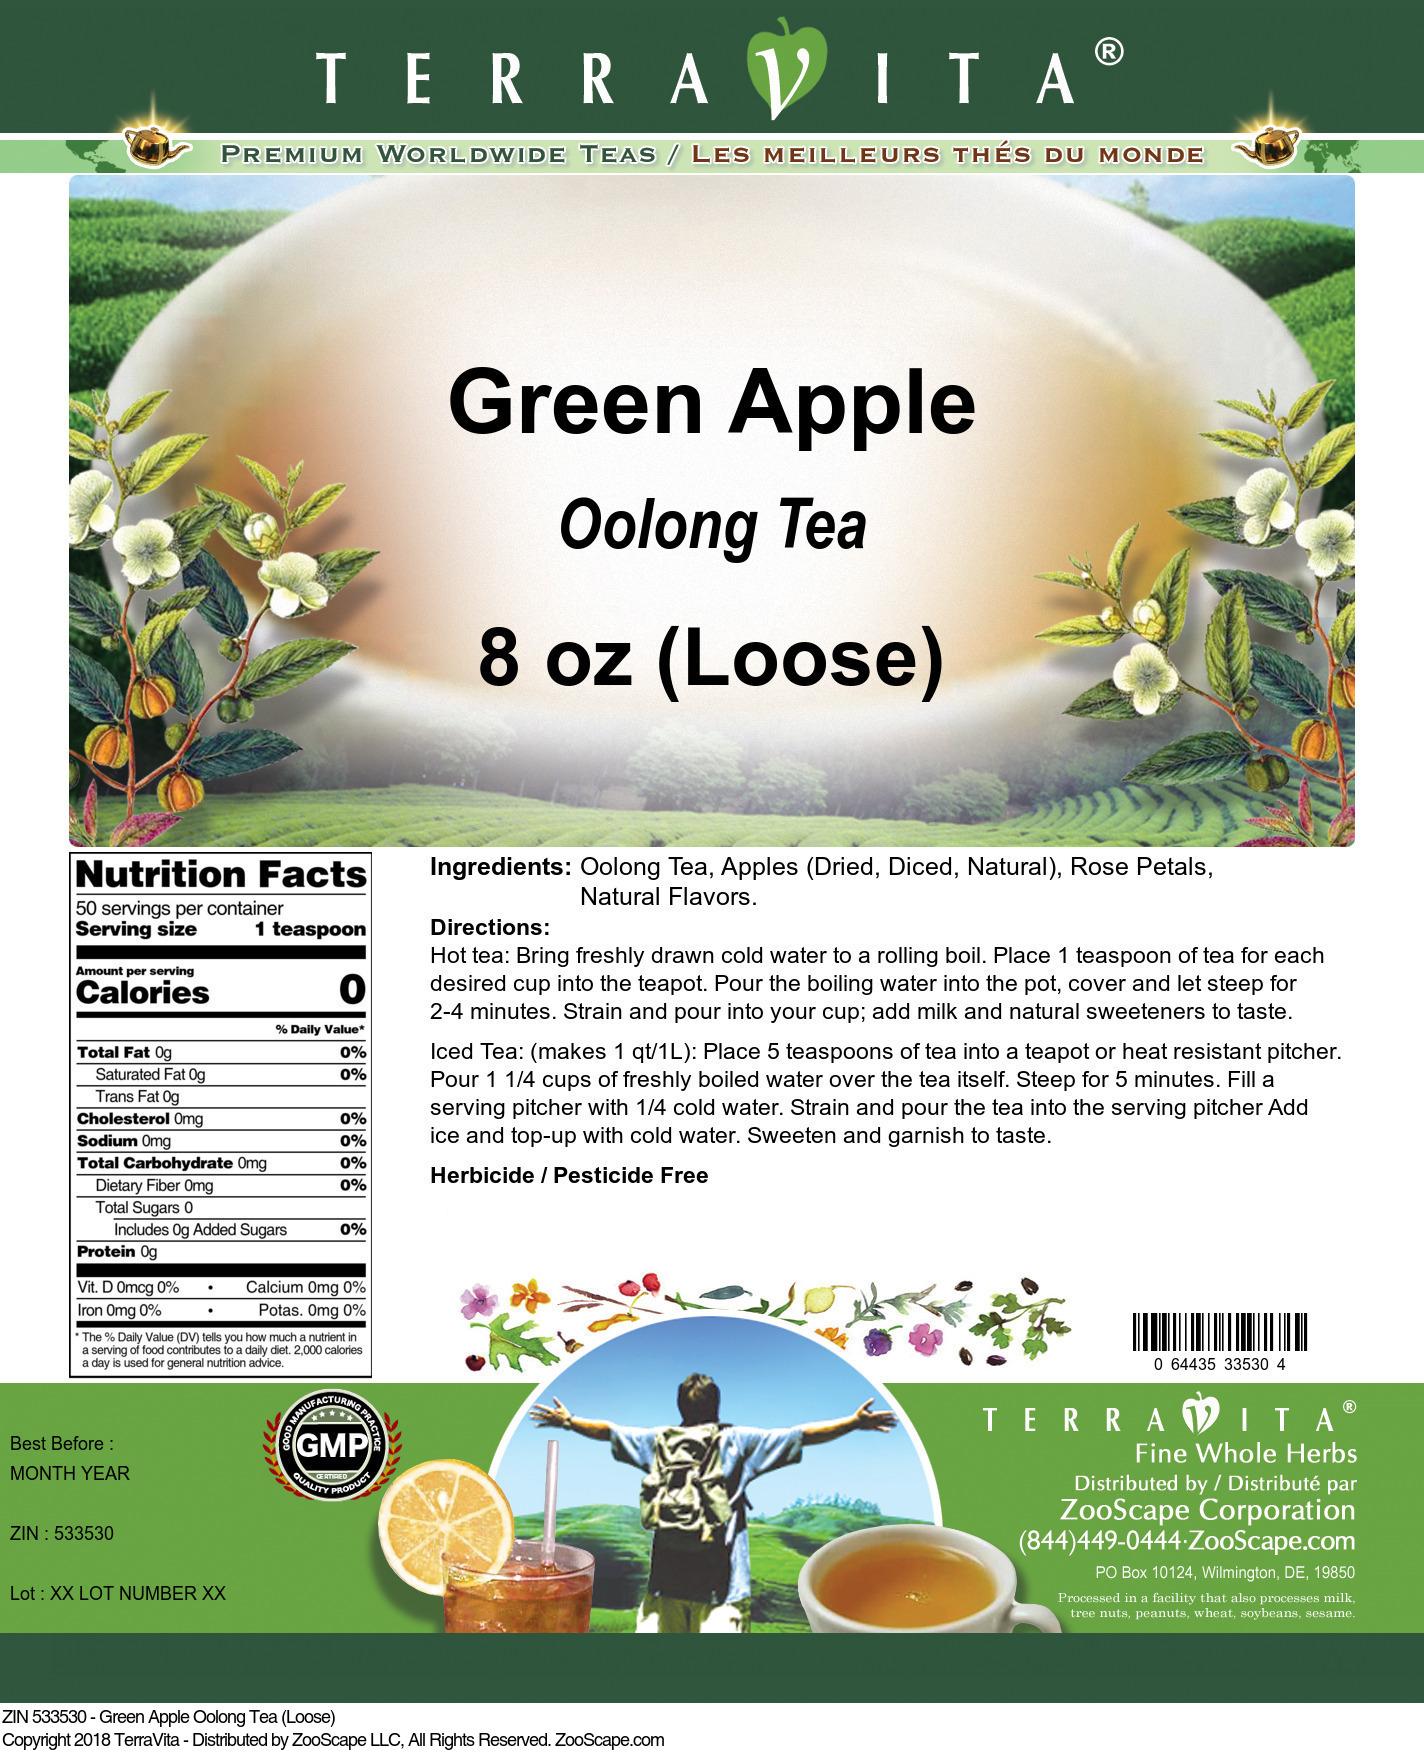 Green Apple Oolong Tea (Loose)